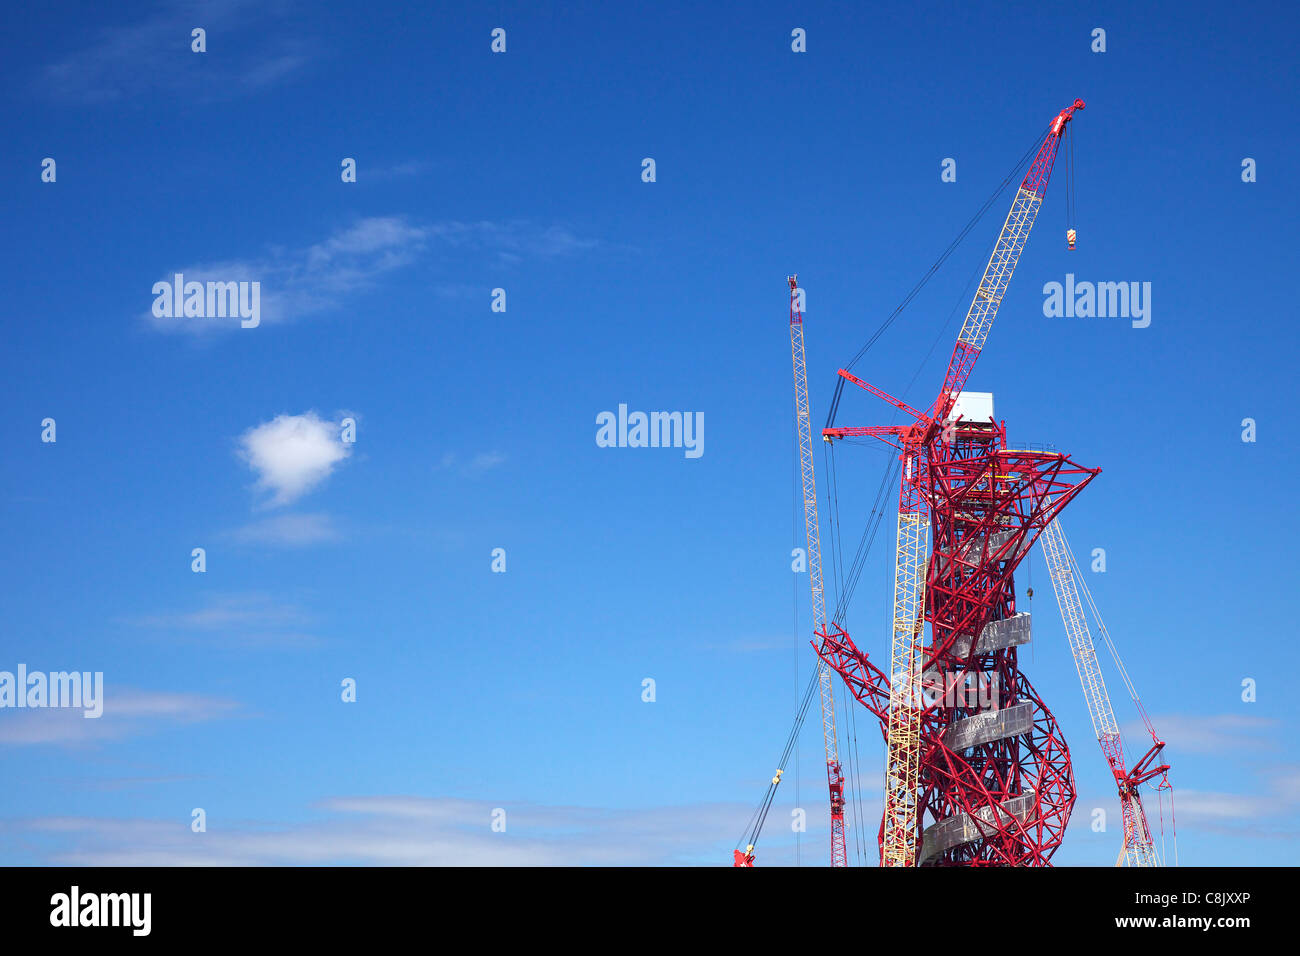 ArcelorMittal Orbit, by Anish Kapoor, Olympic Park, Stratford, East End, London, England, UK, United Kingdom, GB, - Stock Image